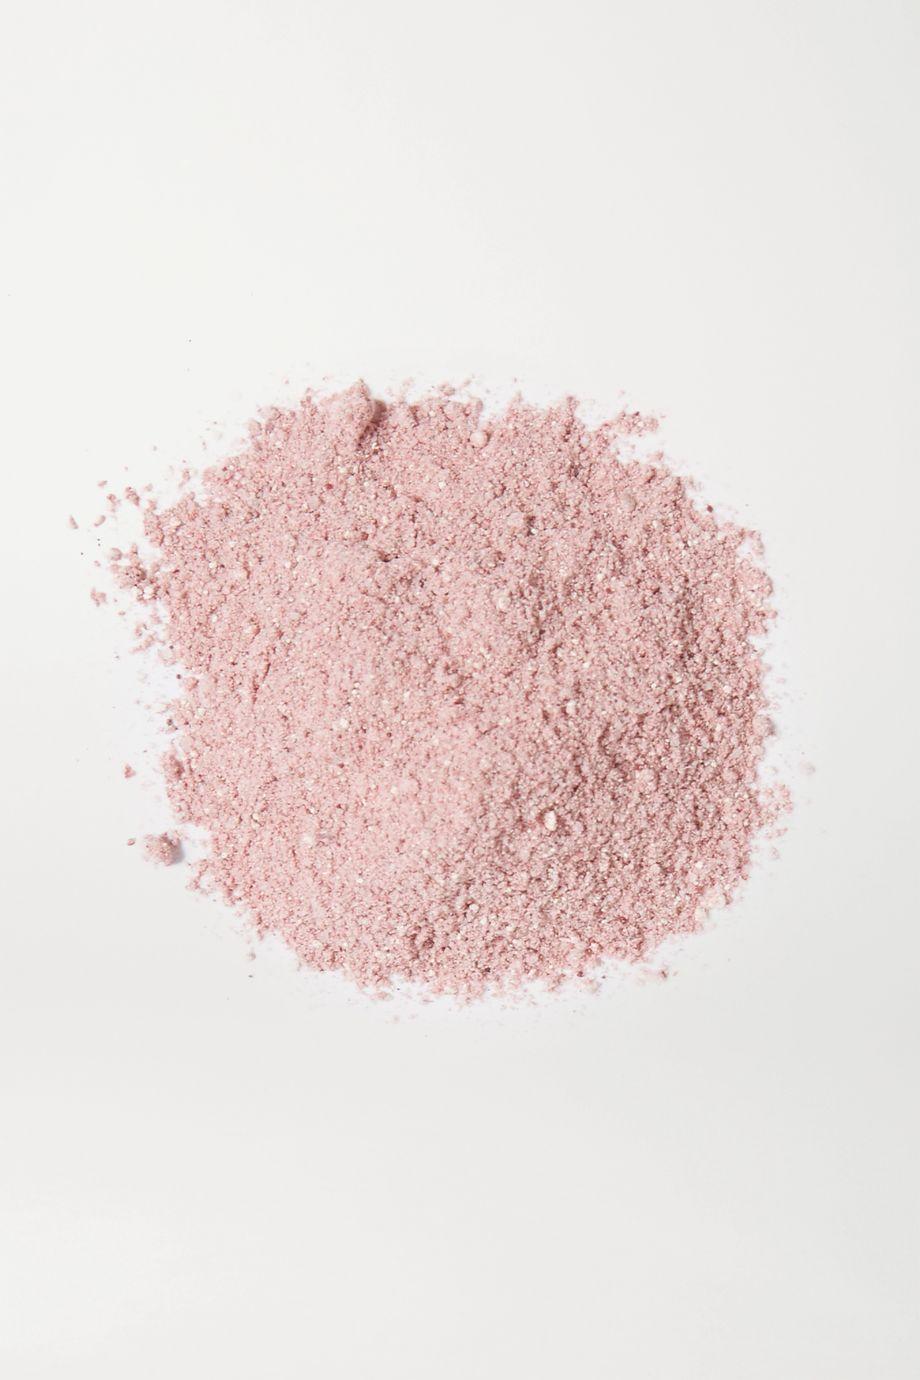 ANCIENT+BRAVE Radiant Collagyn, 250 g – Nahrungsergänzungsmittel